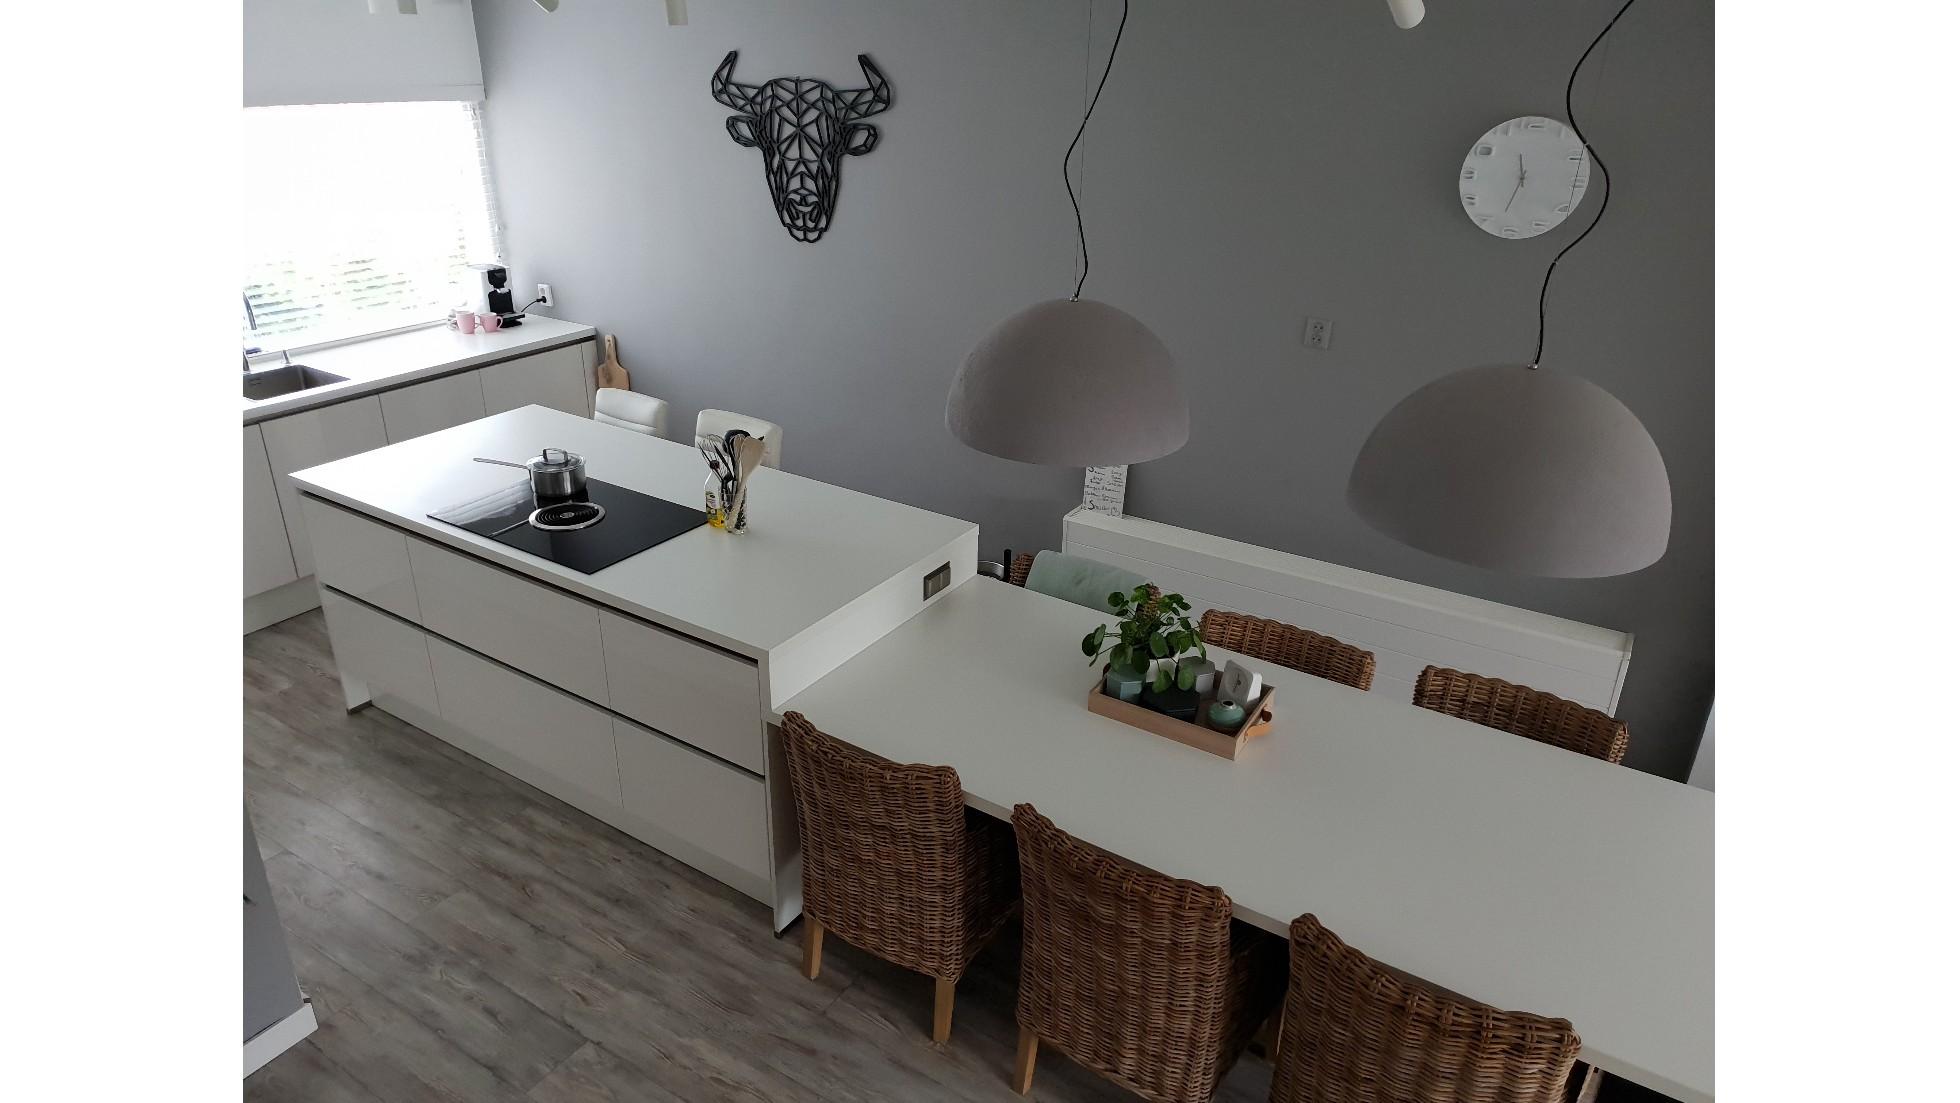 Concordia keuken bad case hoogglans witte keuken